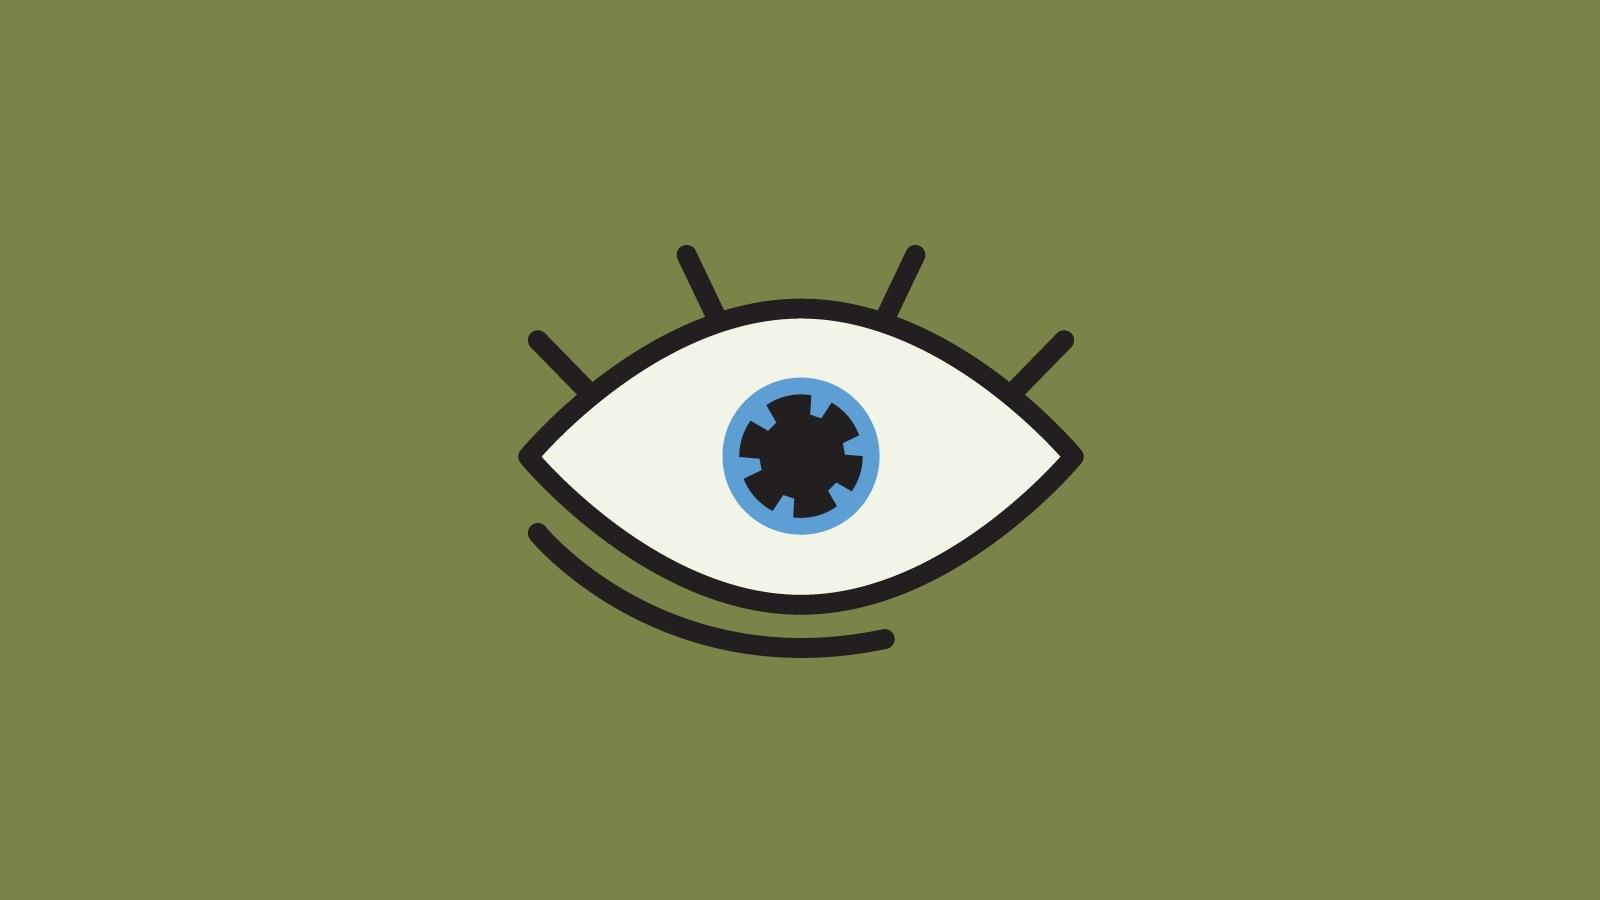 Branding by designer Ben Grandgenett gave the campaign a unique and recognizable voice.